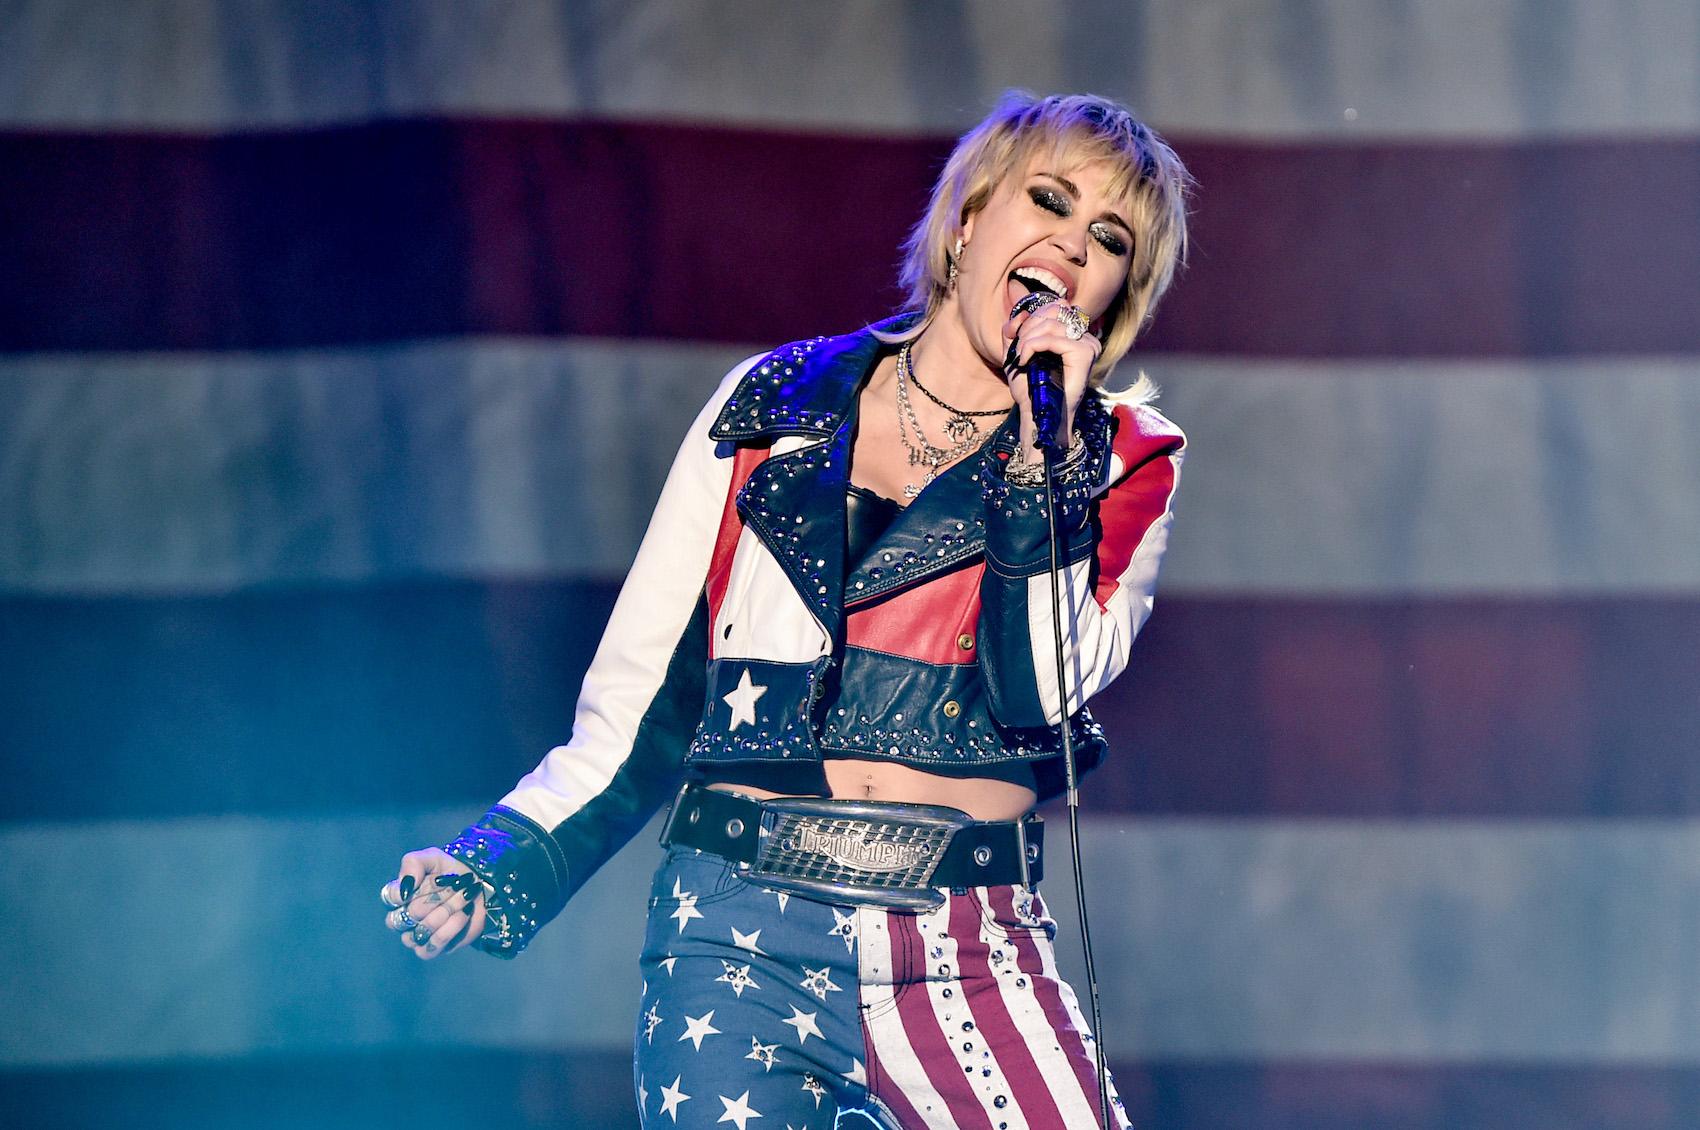 Miley Cyrus kündigt Auftritt beim Super Bowl 2021 an